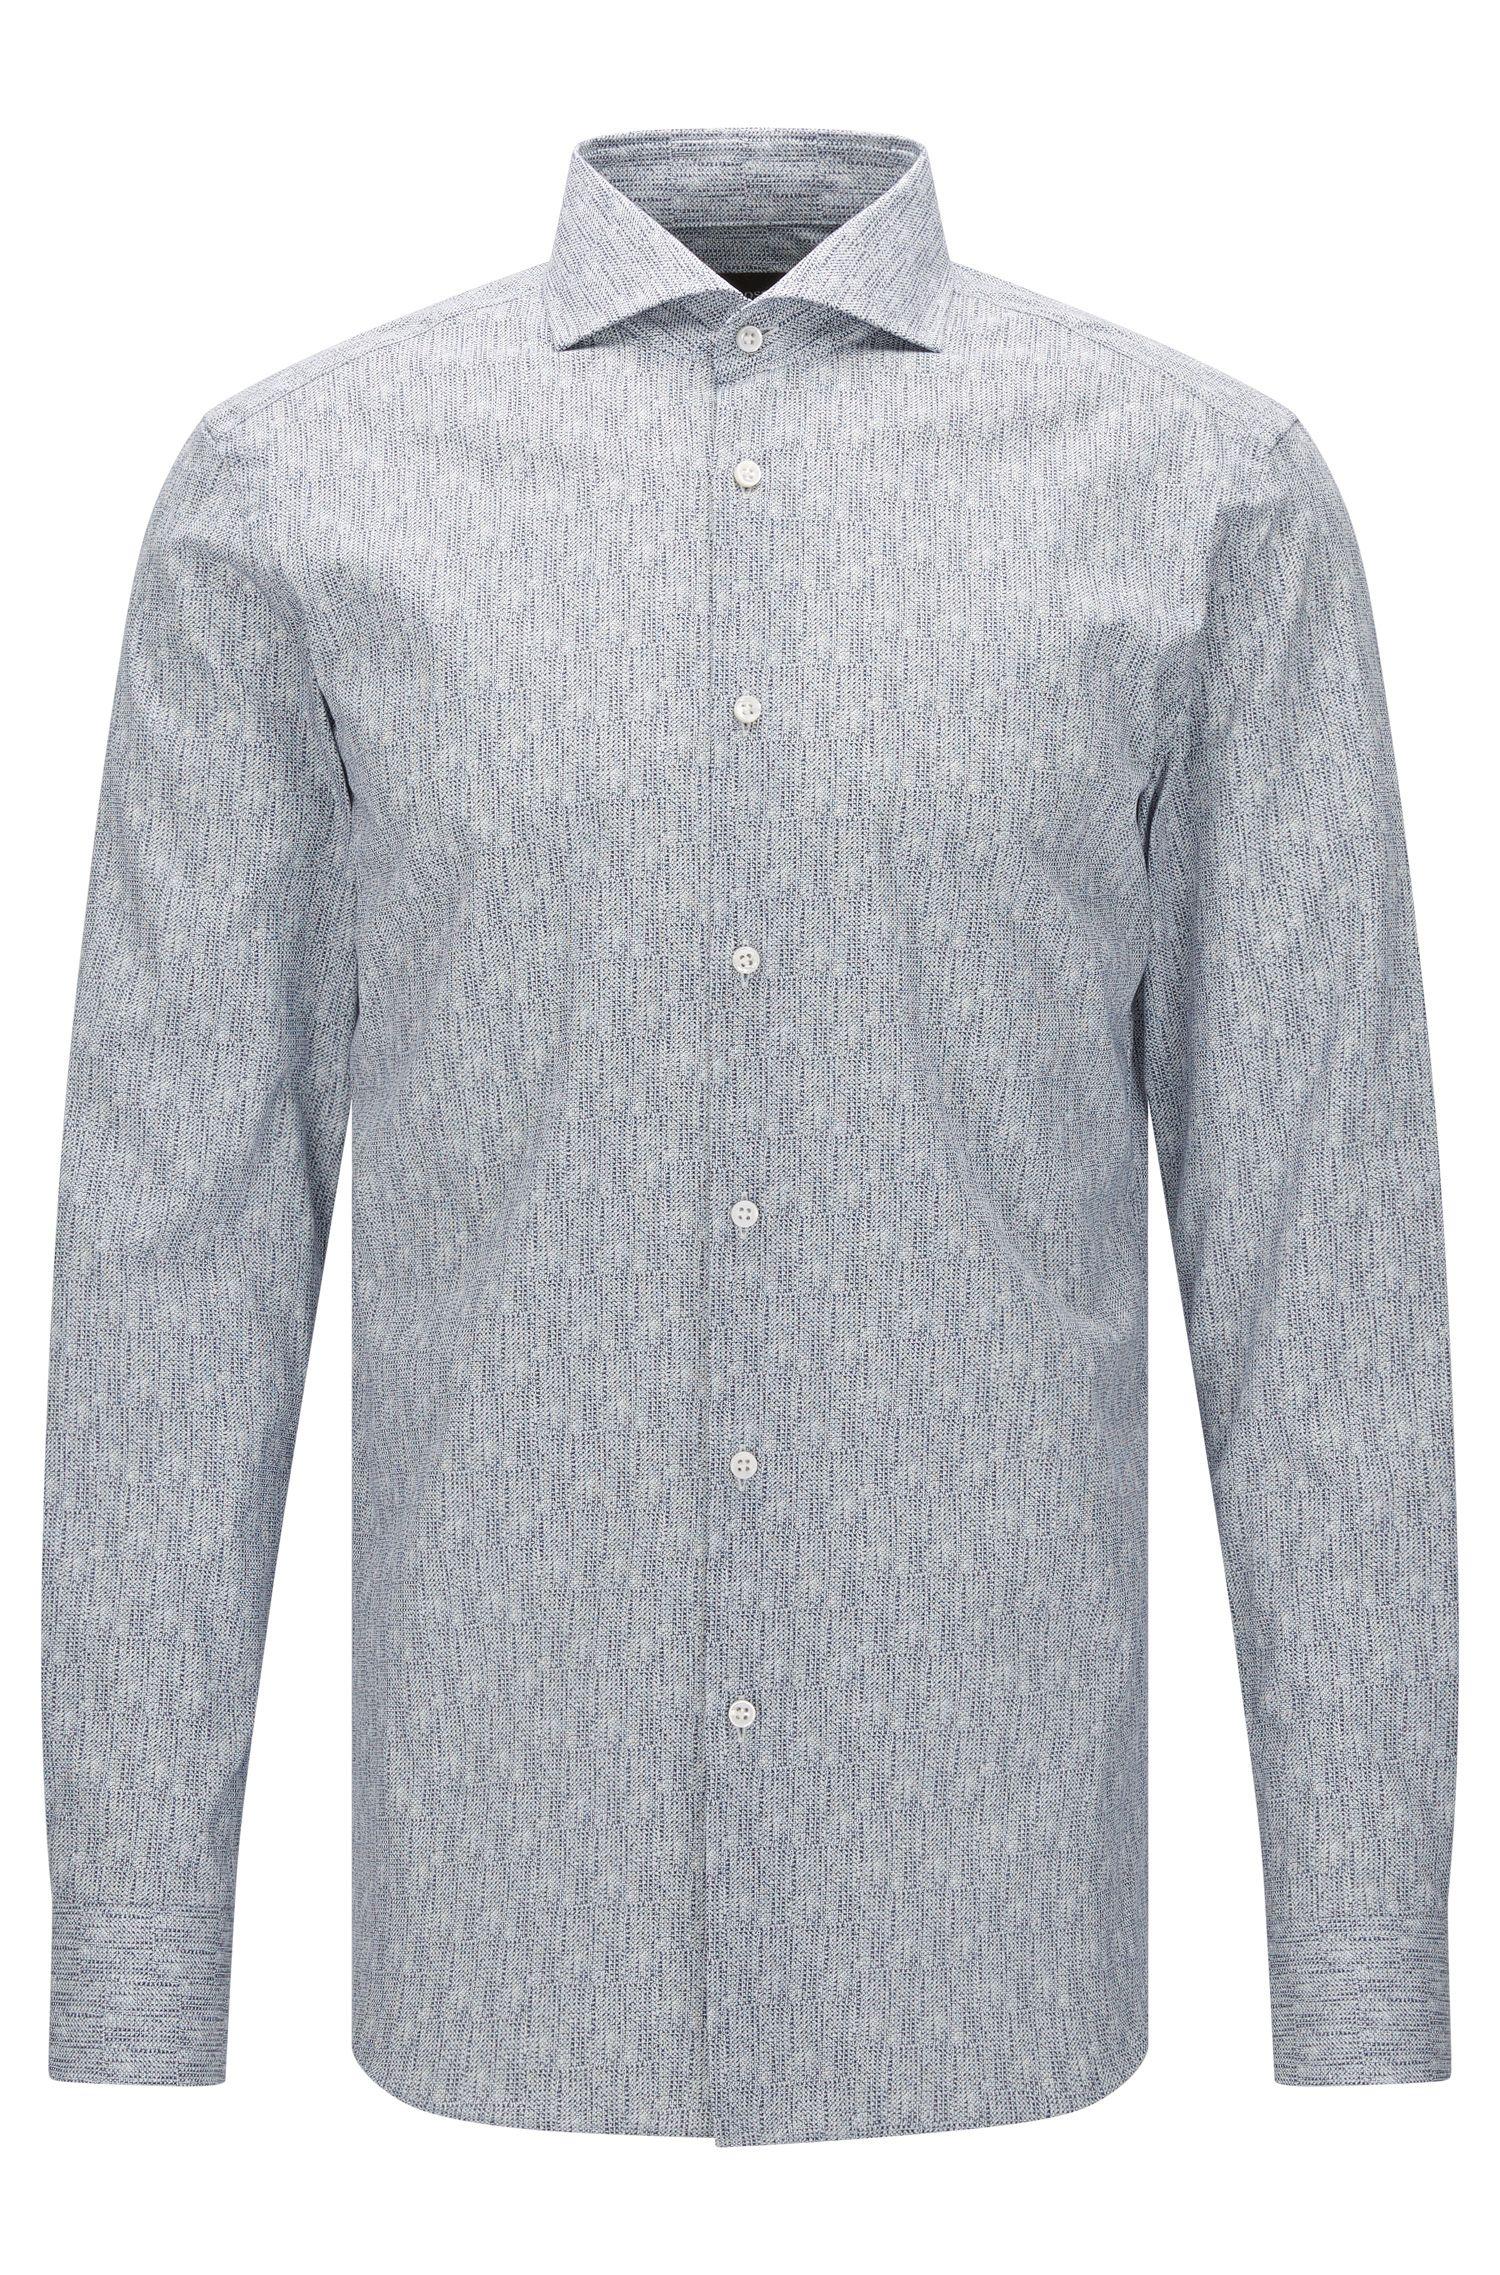 Italian Cotton Dress Shirt, Slim Fit | T-Christo